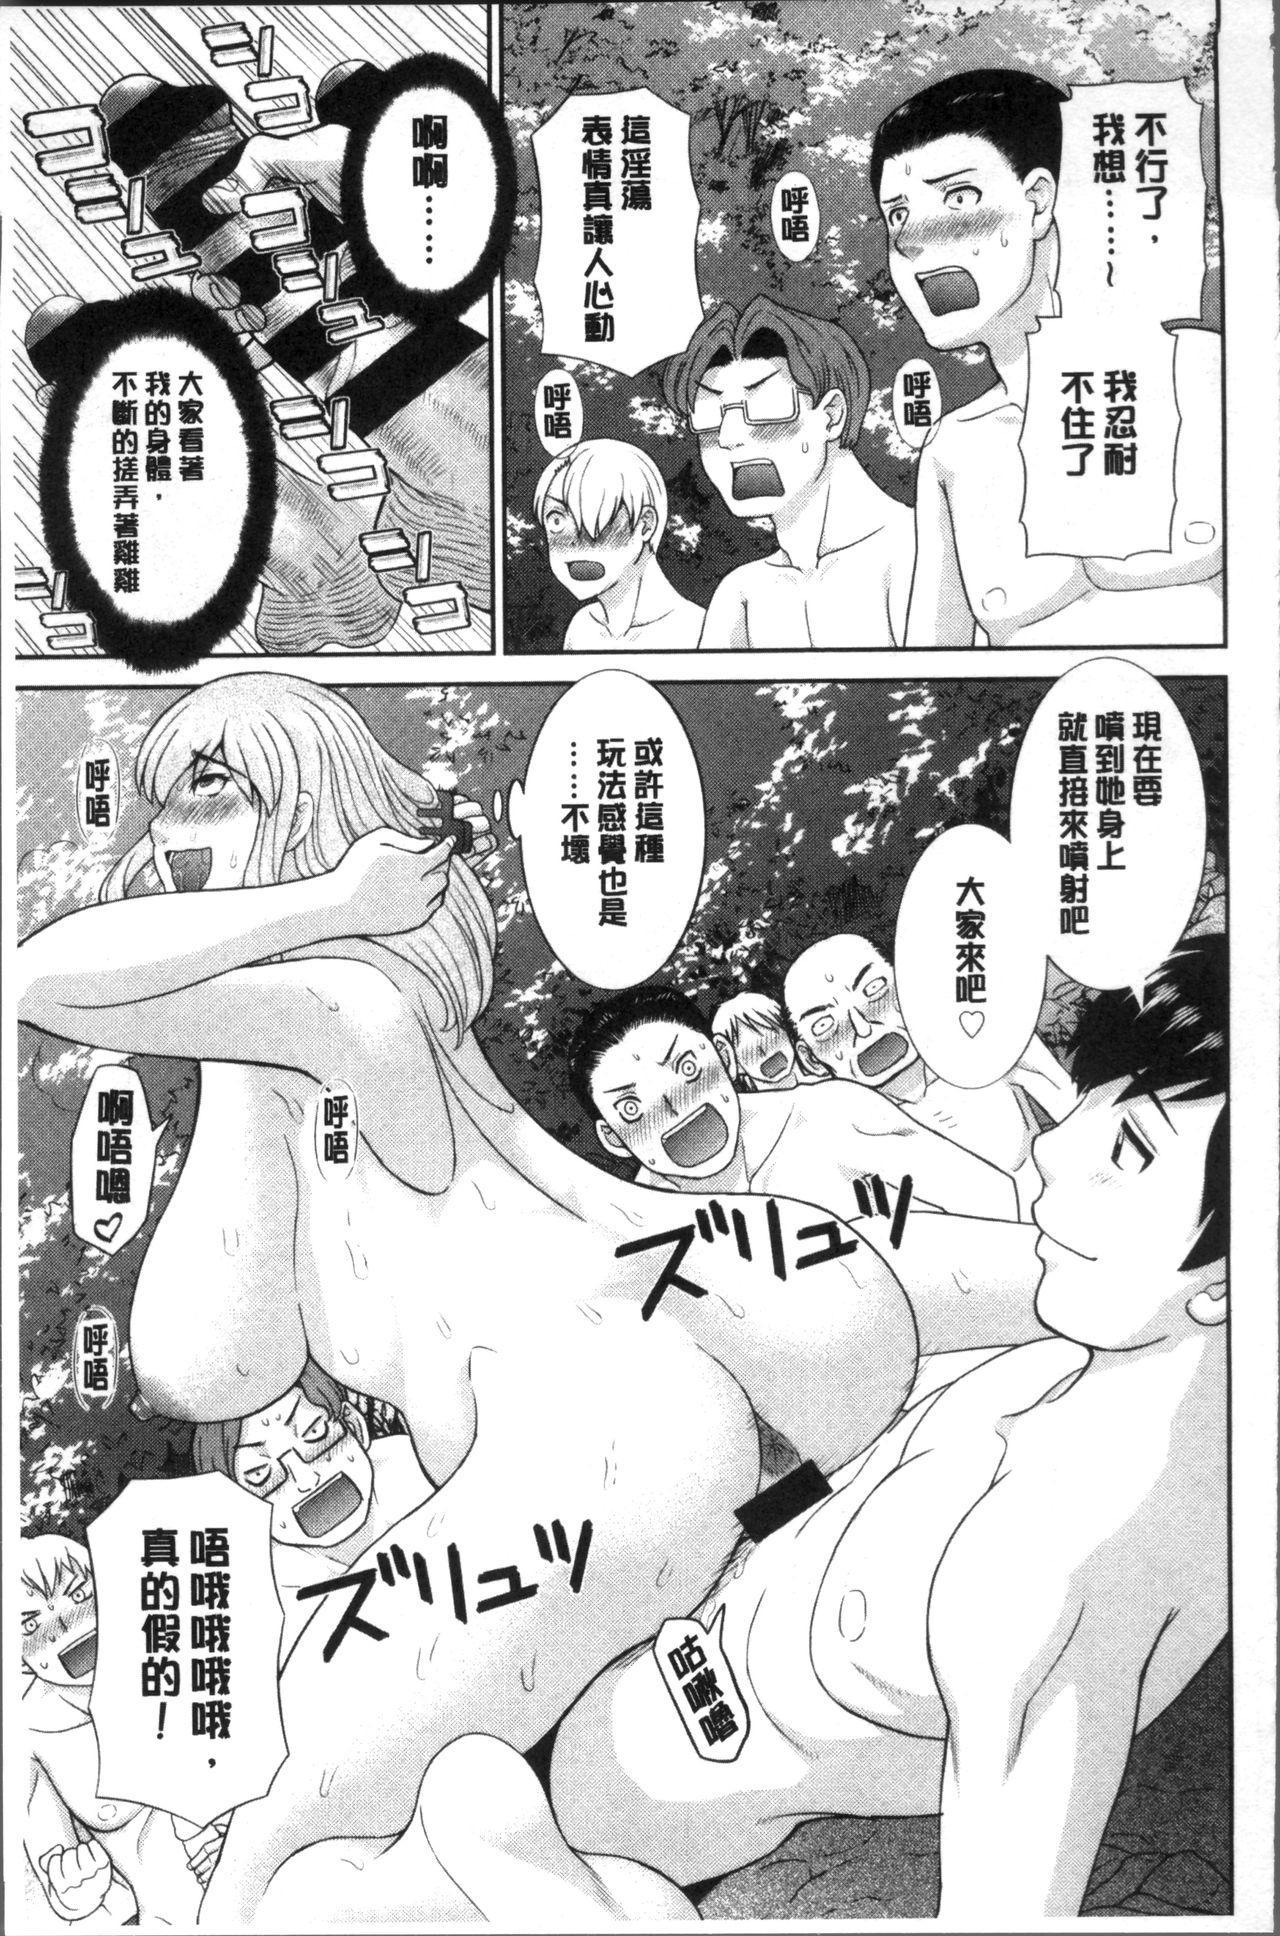 [Kawamori Misaki] Innyuu Shufu no Futei Ganbou - Oku-san to Kanojo to 2 | 淫乳主婦的不貞願望 和人妻也和女友❤2 [Chinese] 92